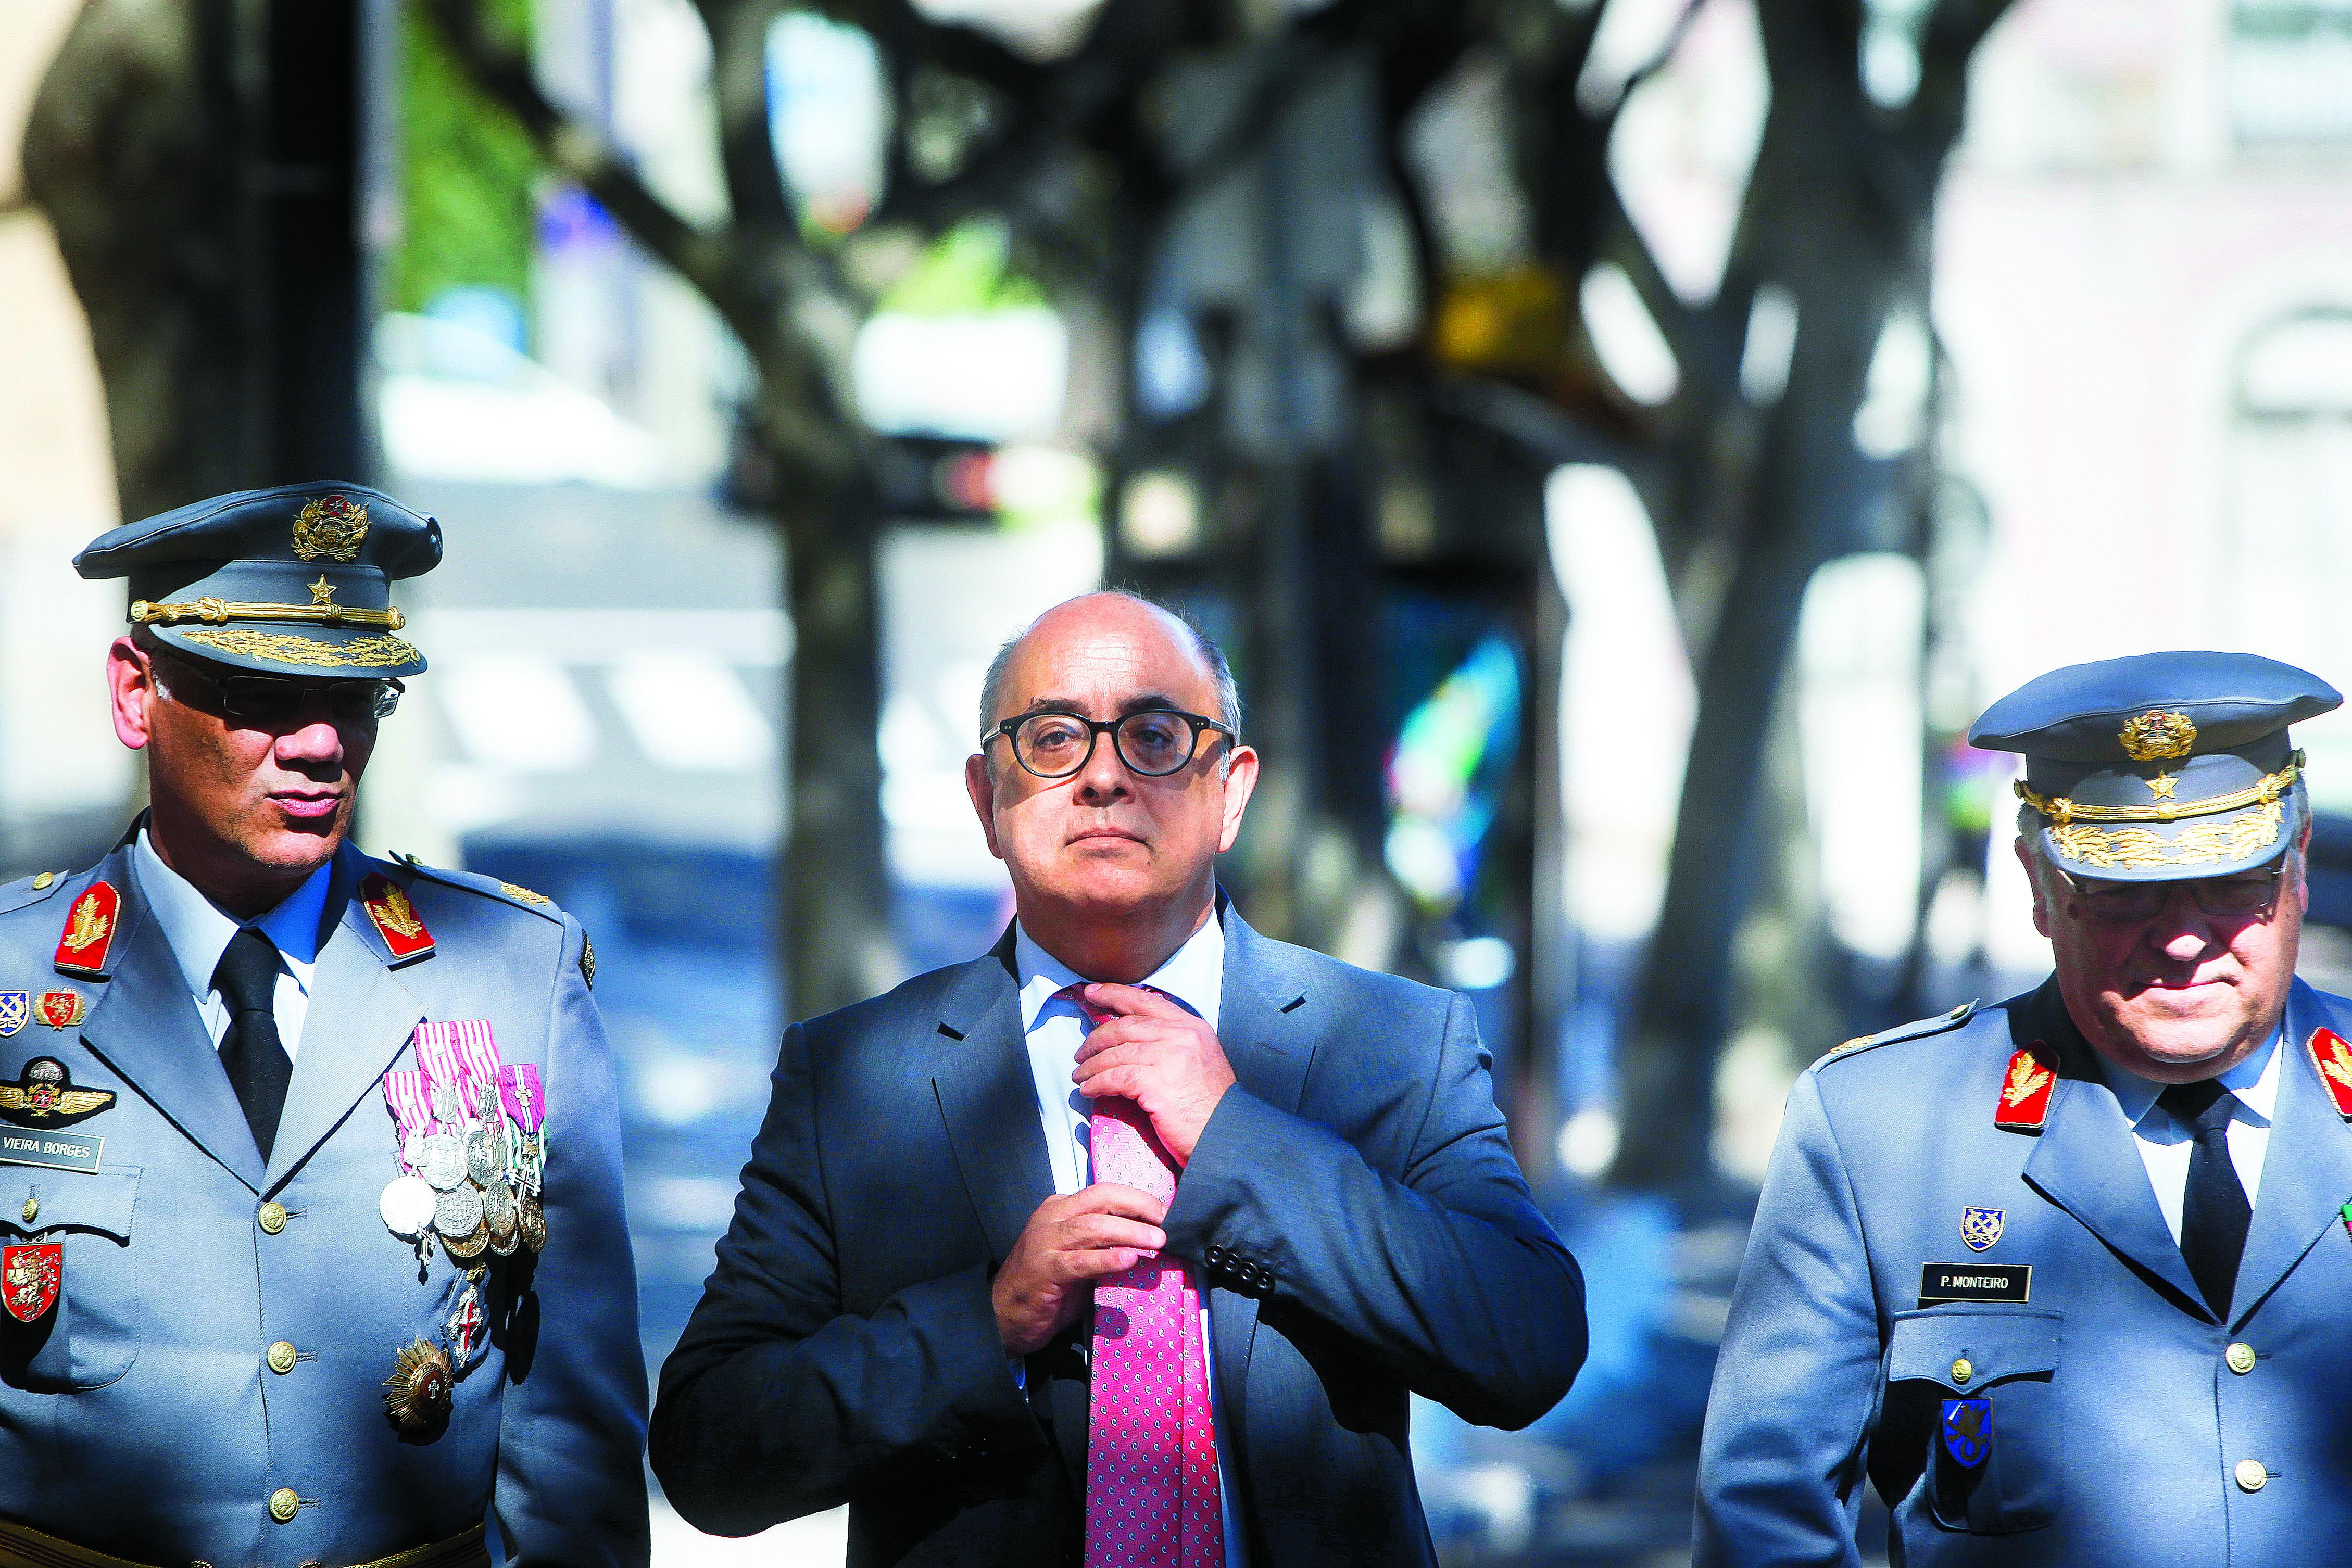 PSD e CDS marcam debate sobre